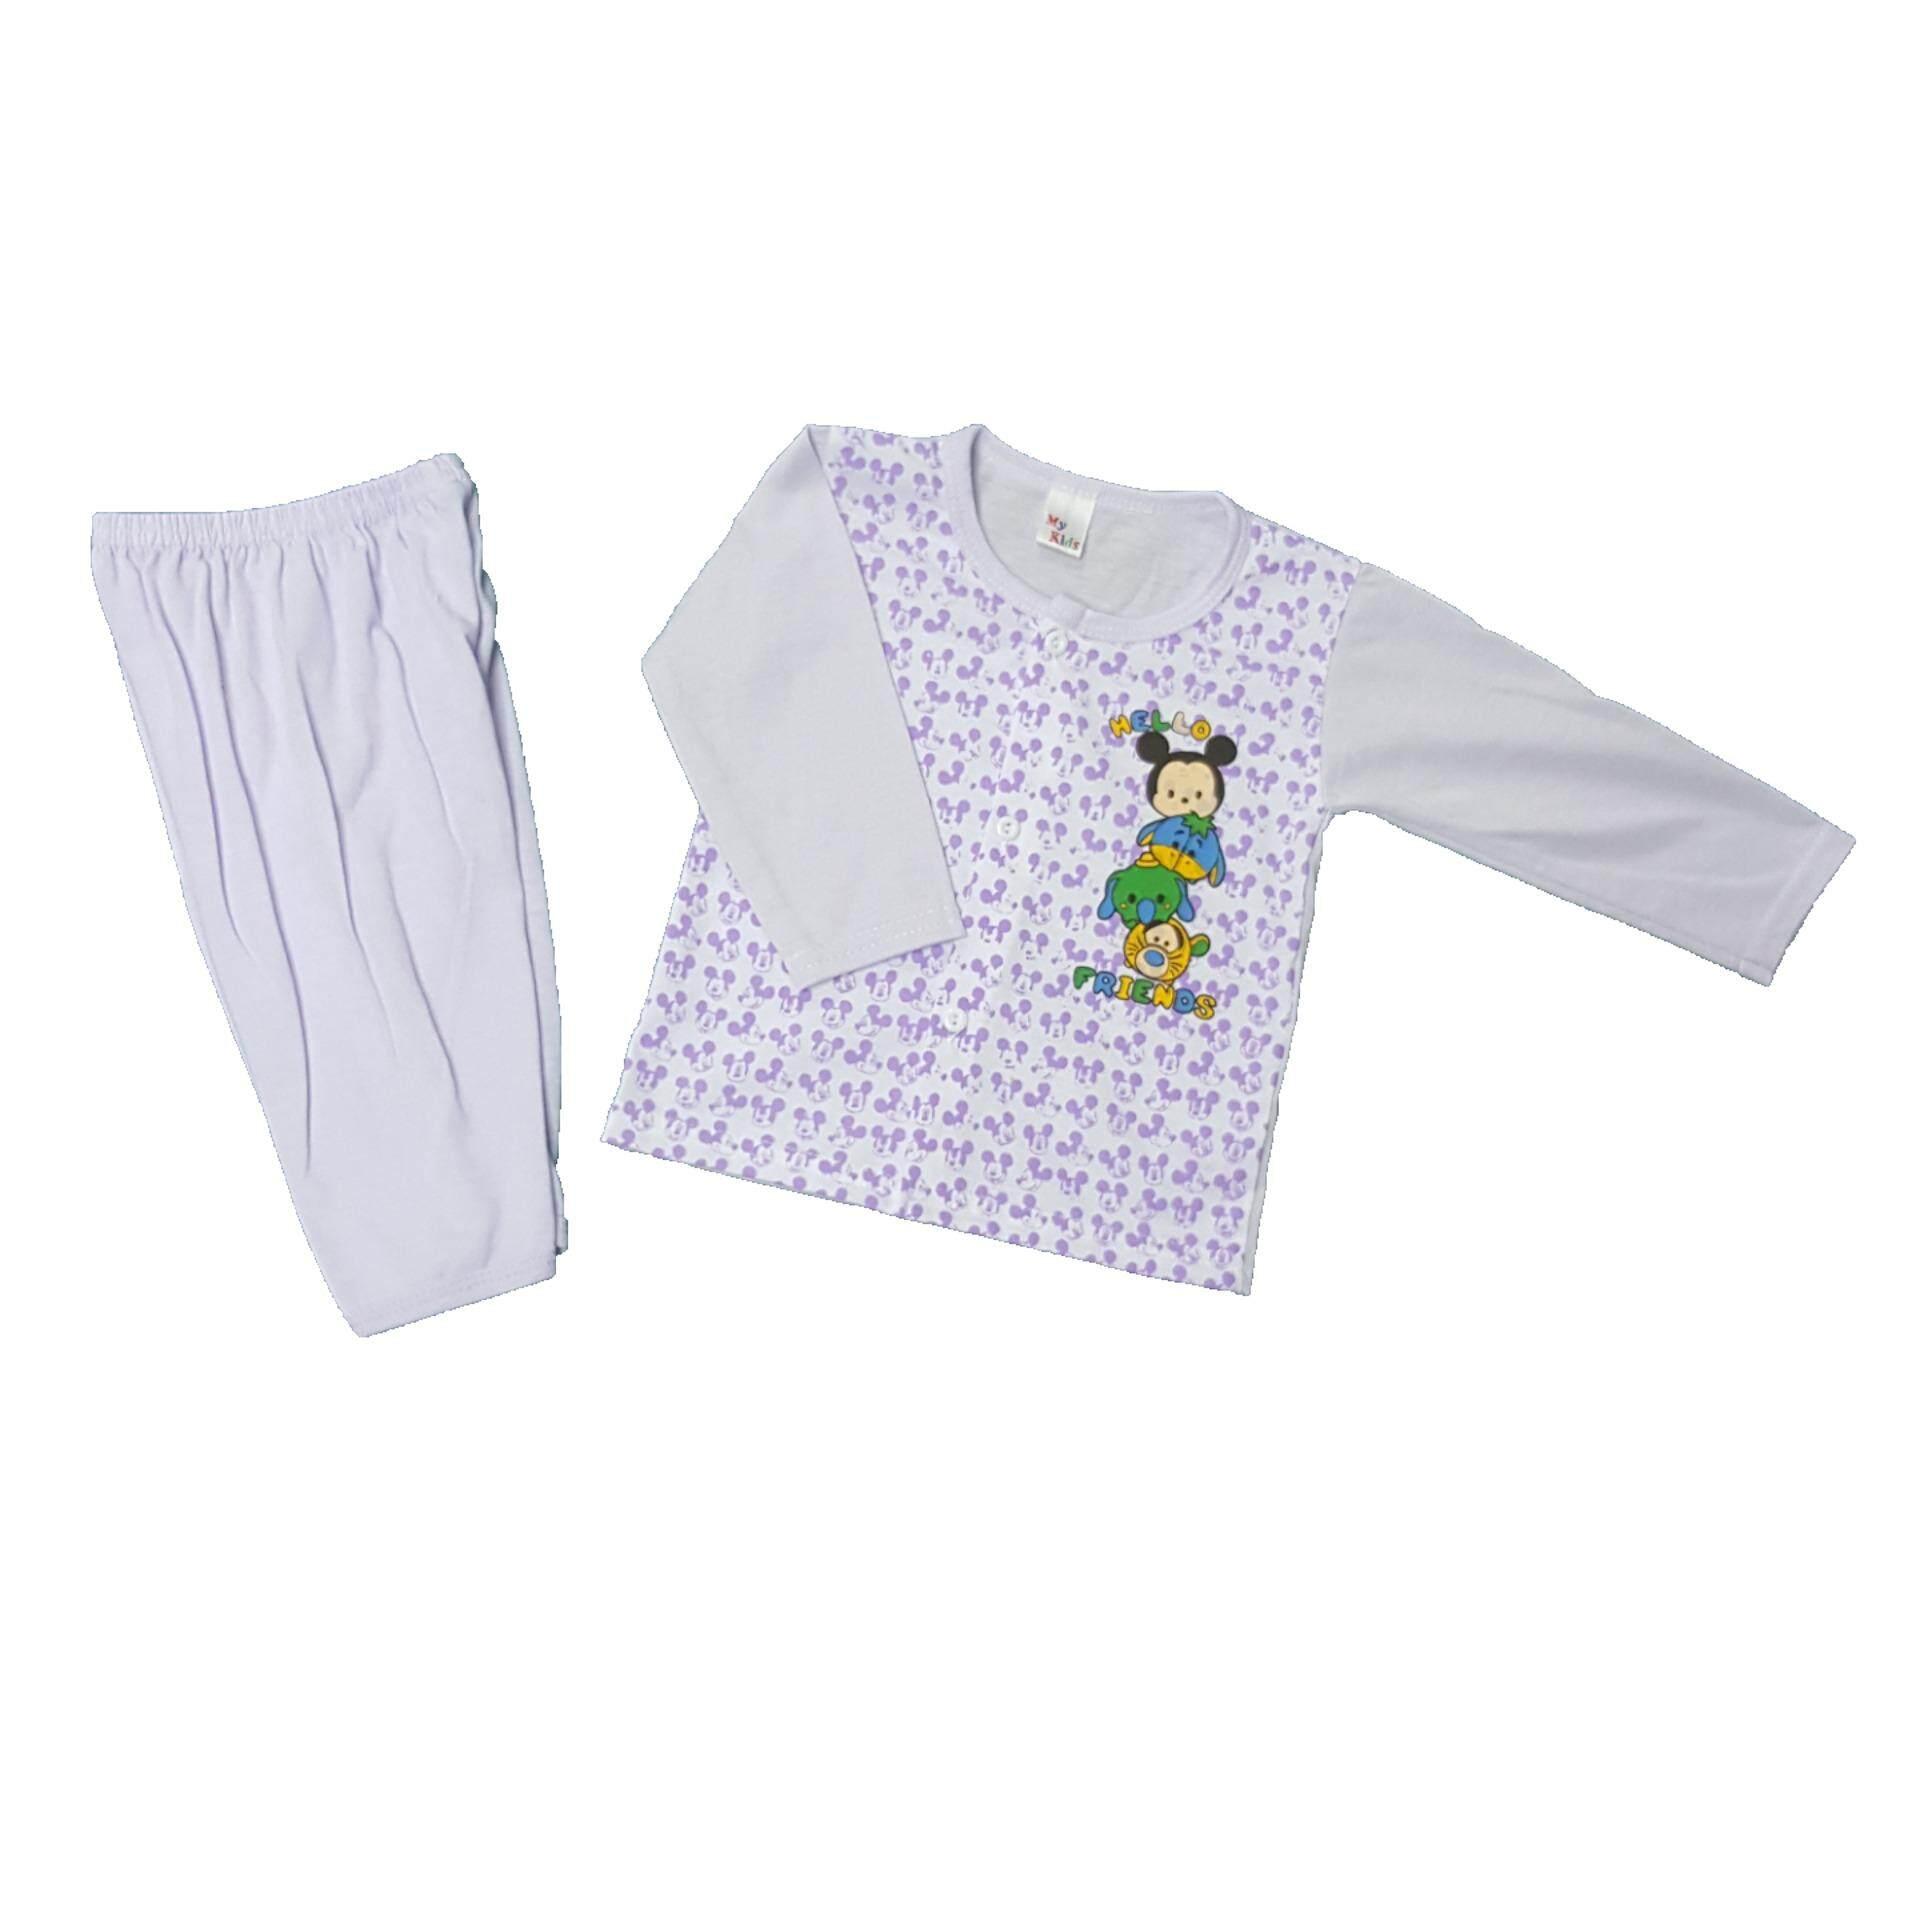 NewBorn & Baby 3 SET Pajamas -001 (Fit to Age: 6-18Mth Mass:8-12kg Height:69-80CM)